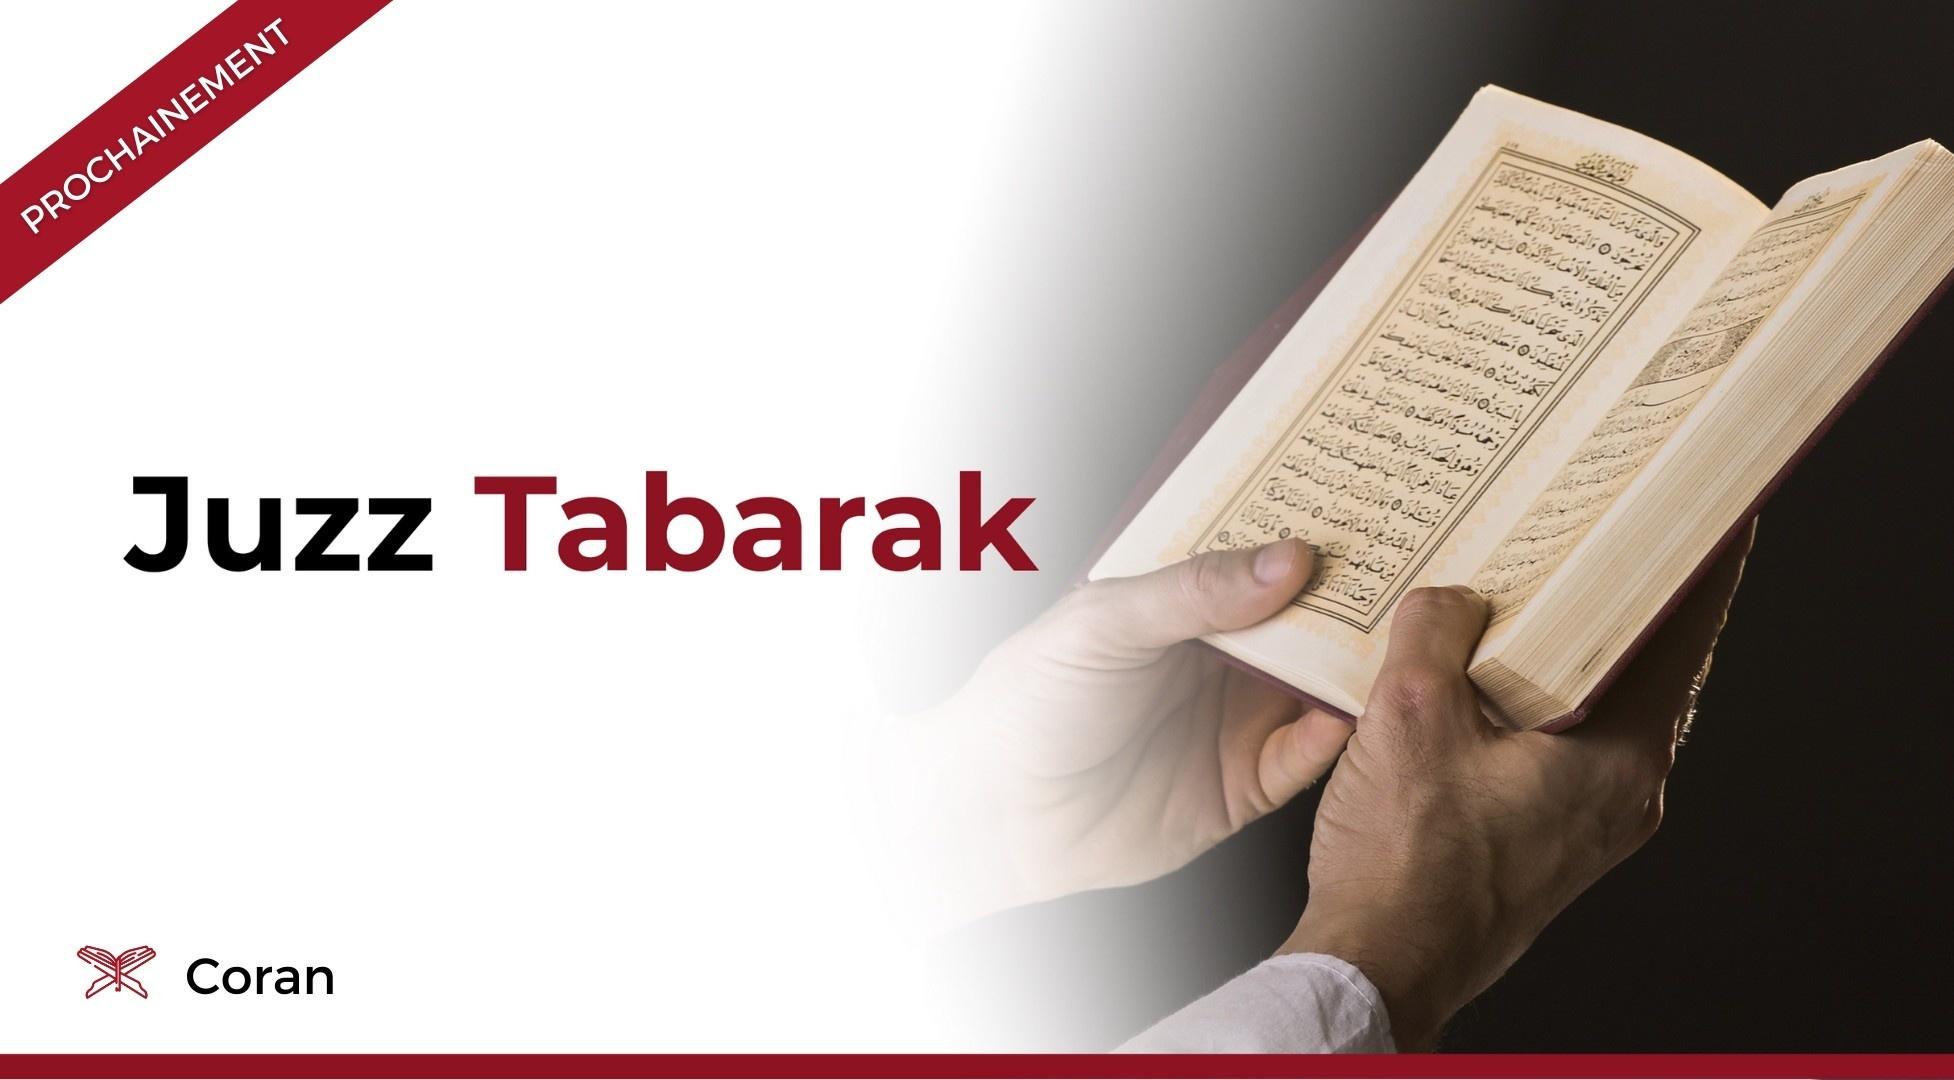 Taqwa, la meilleure des provisions